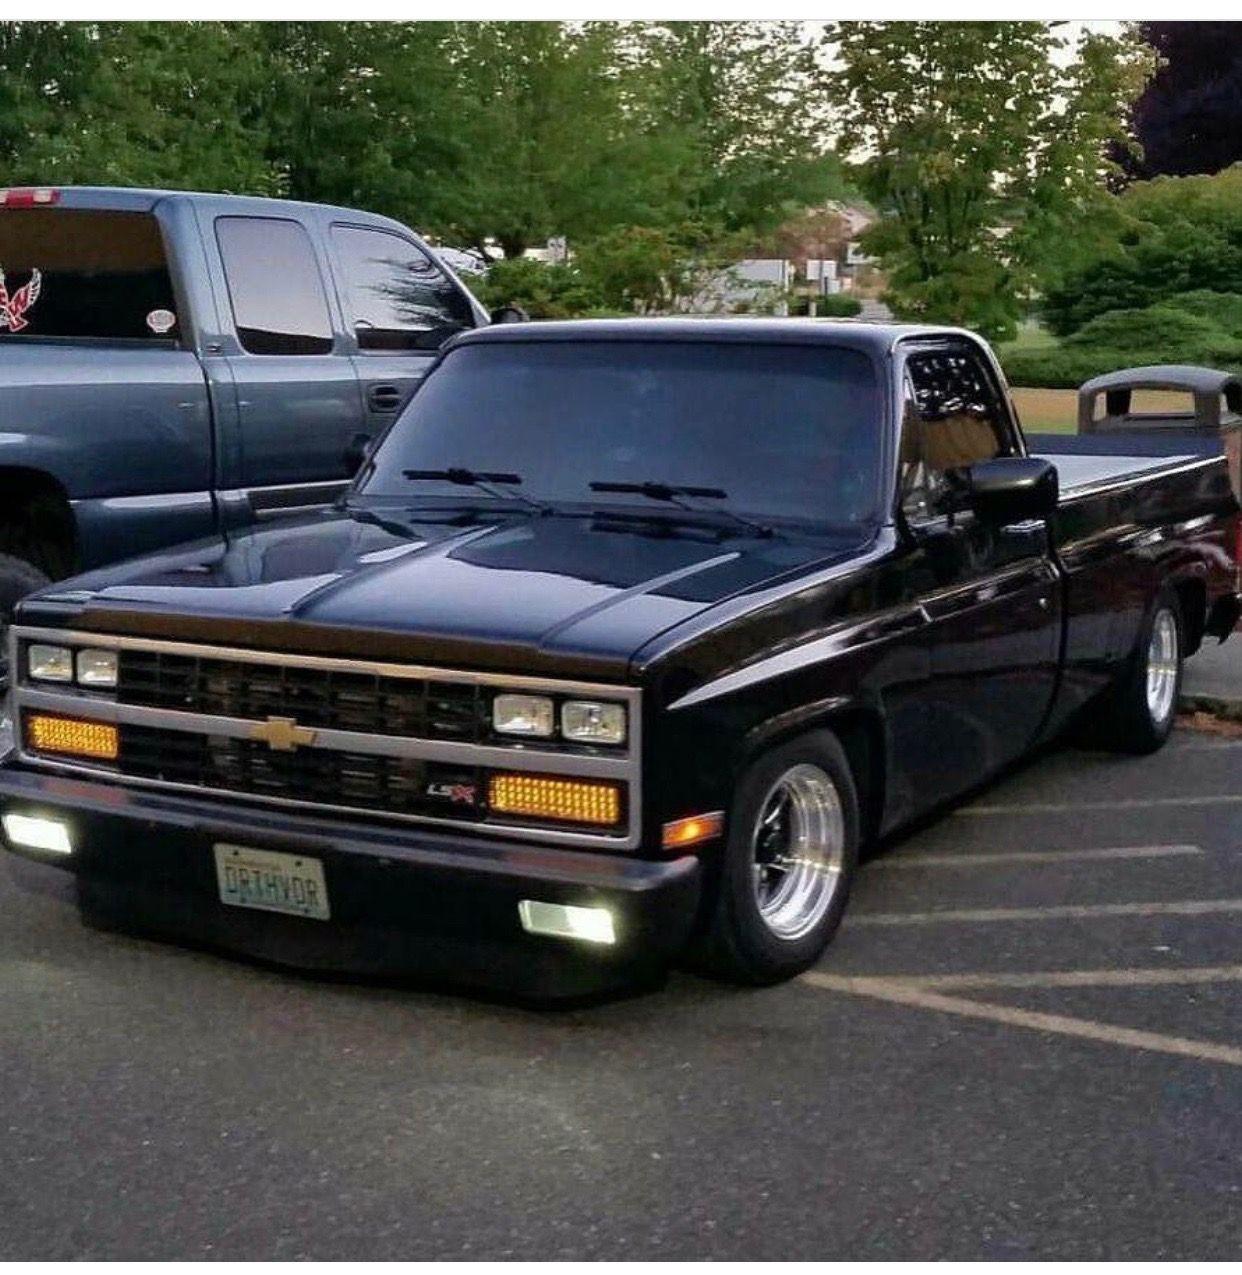 Pin by Barron Salvess on CHEVY TRUCKS | Pinterest | Cars, Chevrolet ...